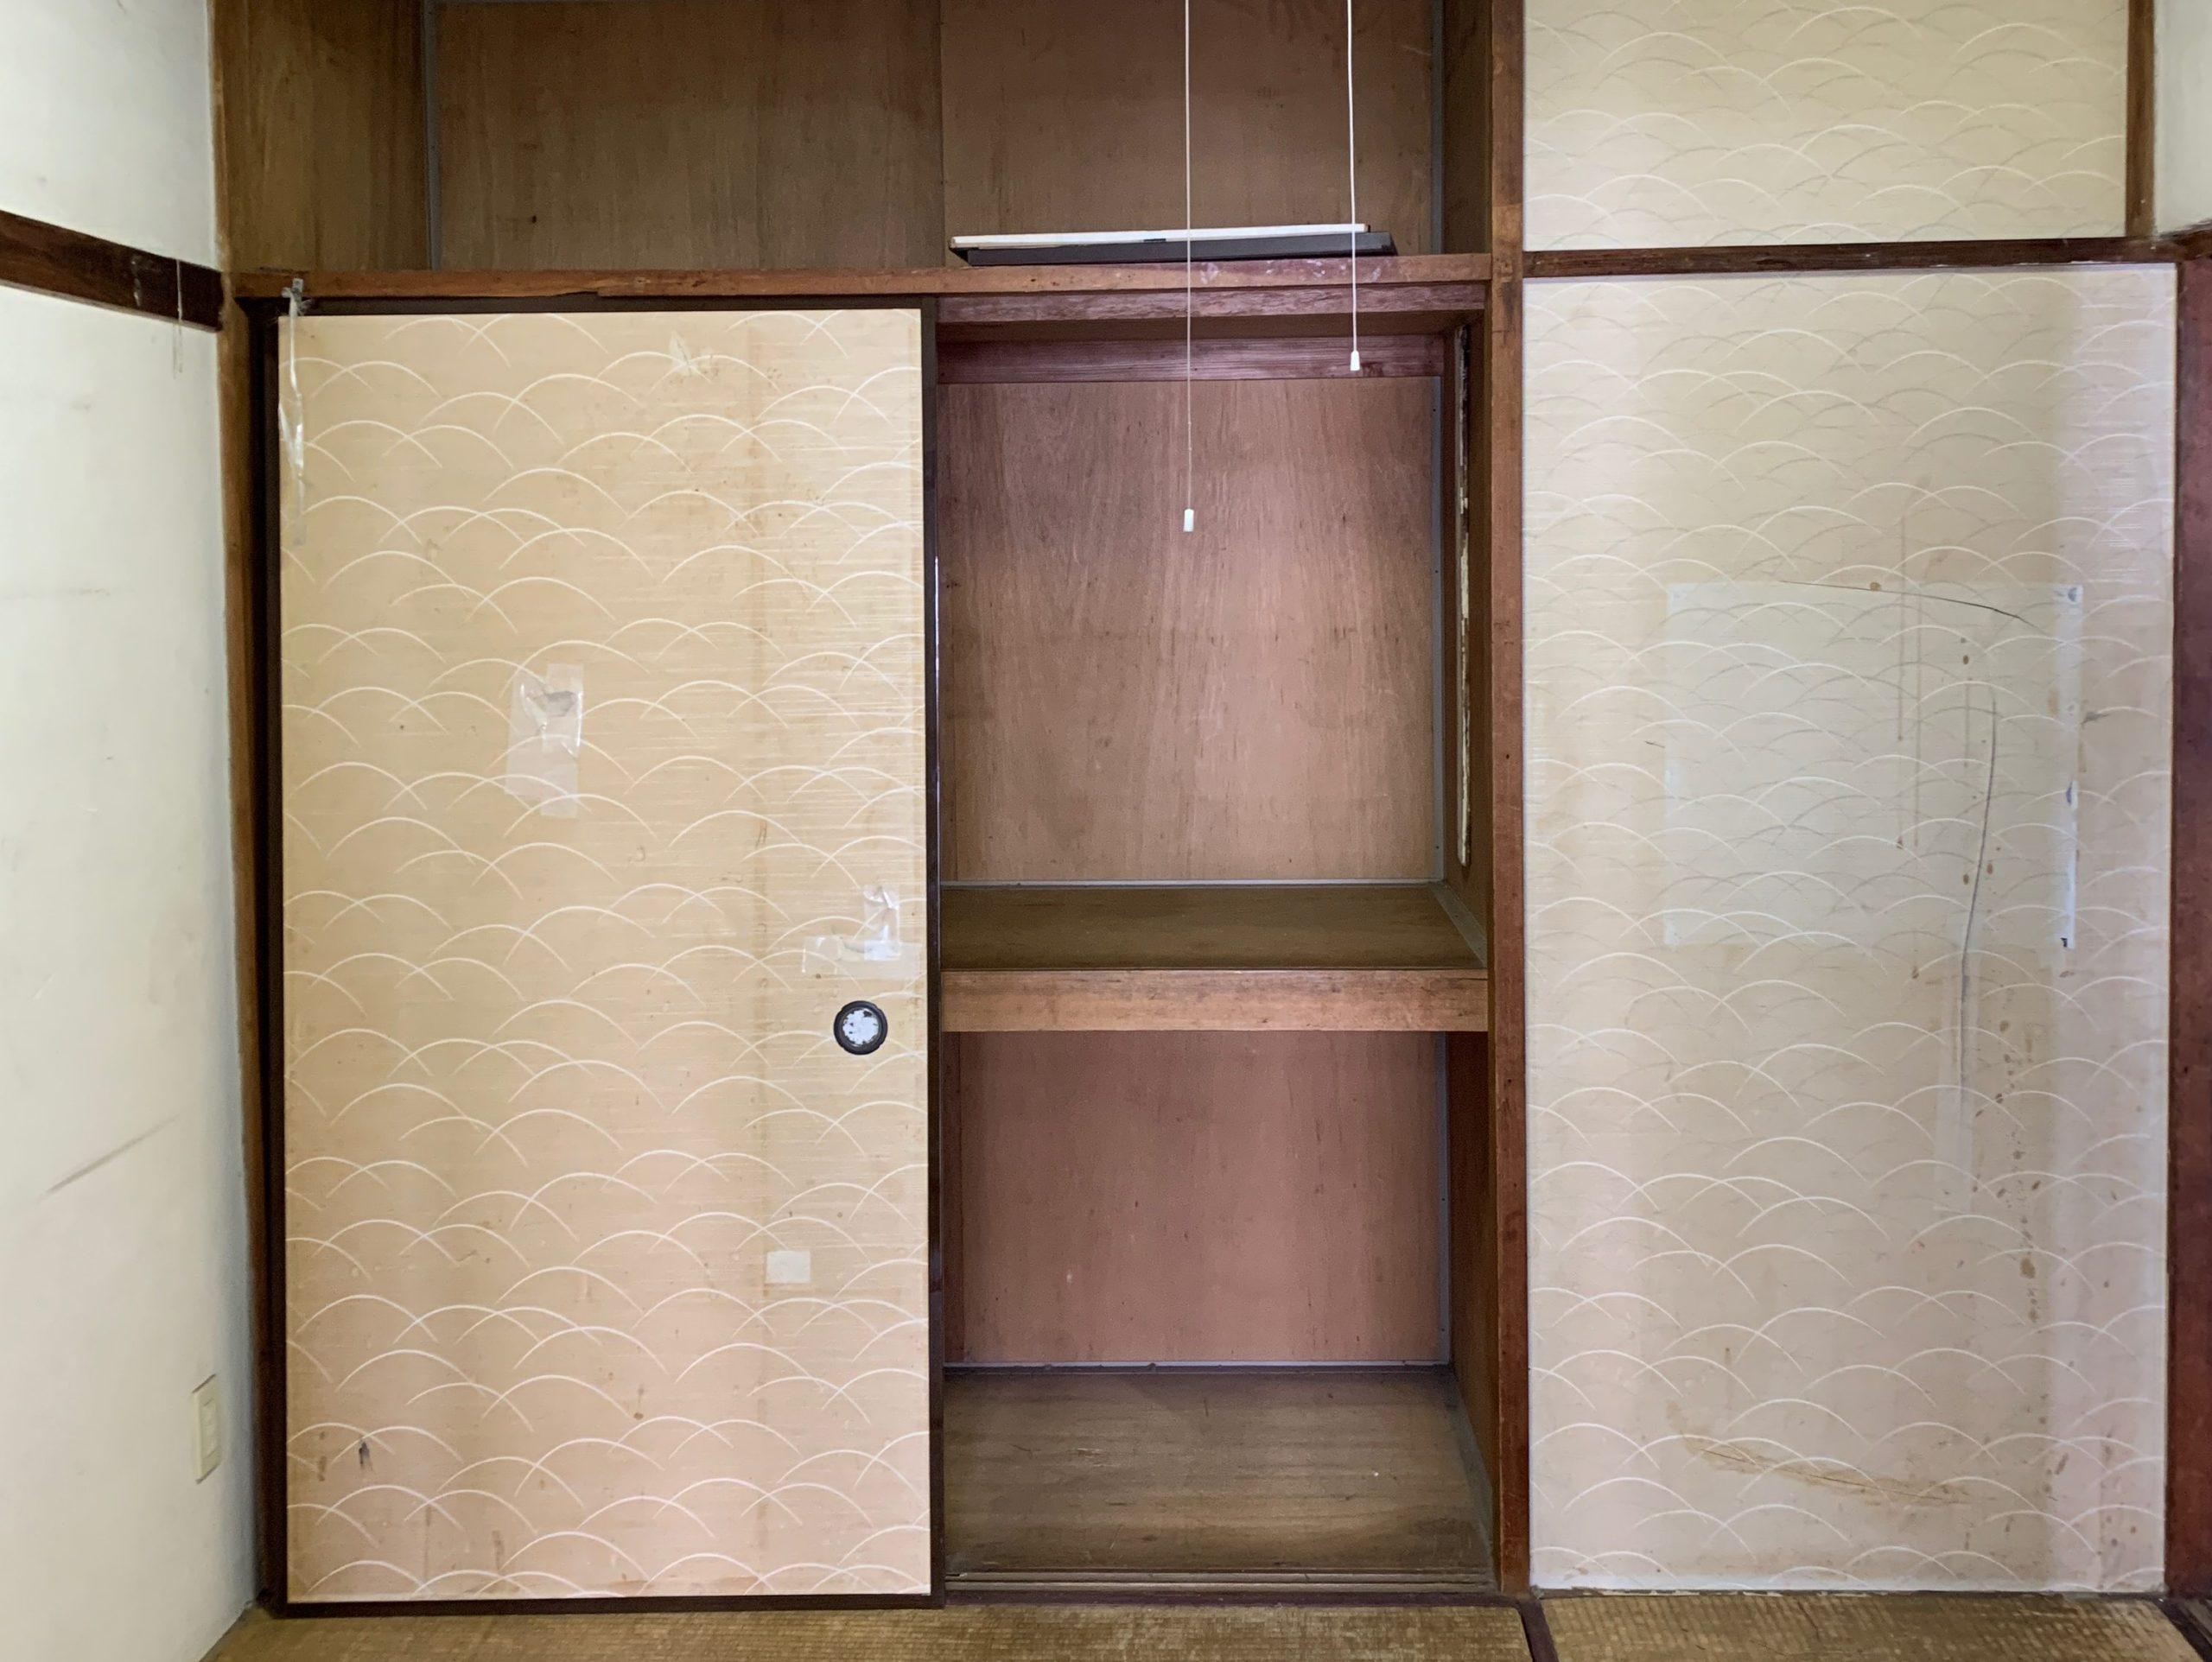 都営住宅の残置物処分(生前整理)後の写真(部屋2)目黒区